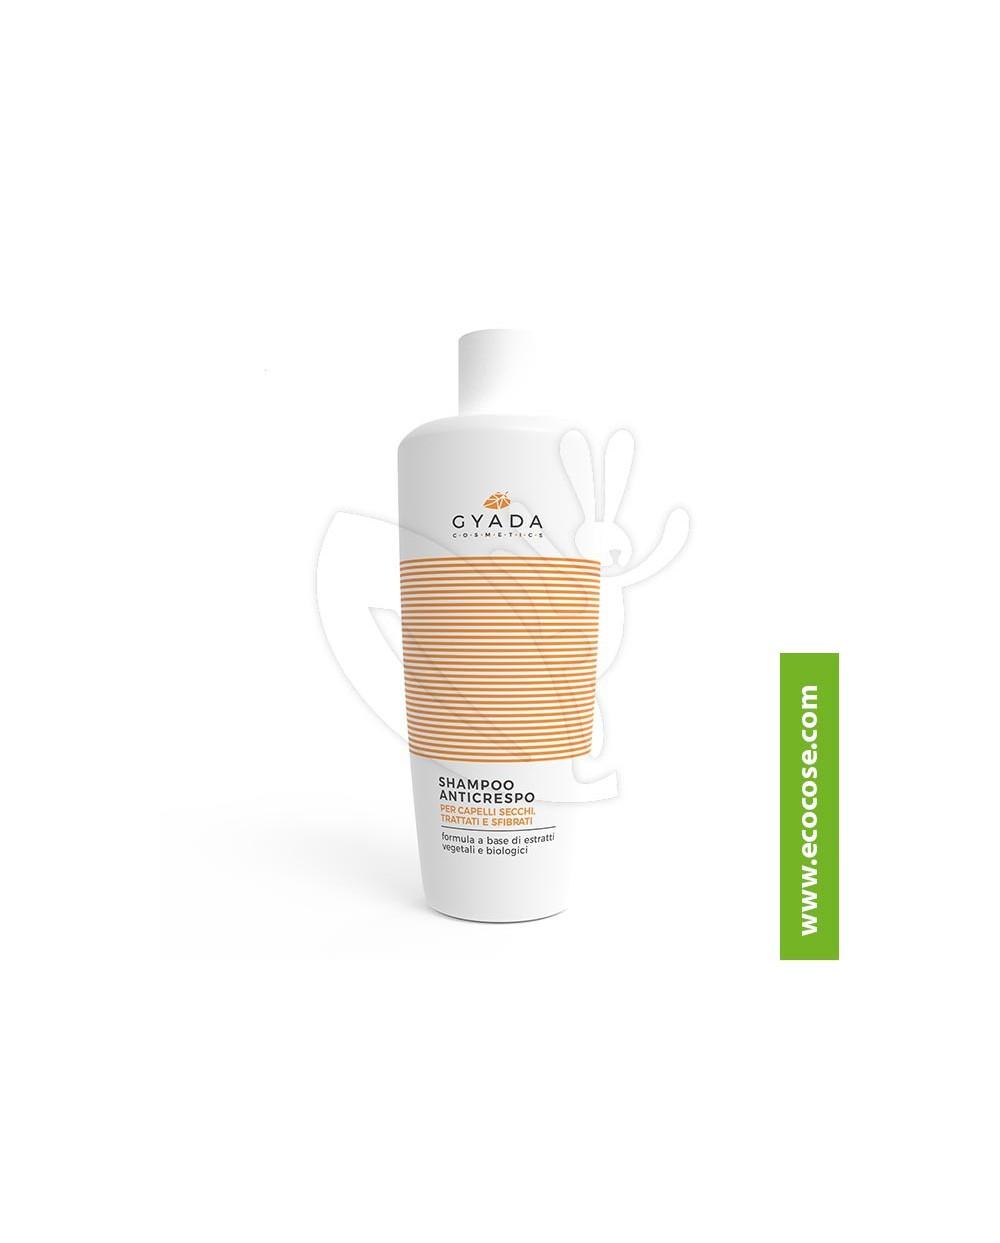 Gyada Cosmetics - Shampoo anticrespo